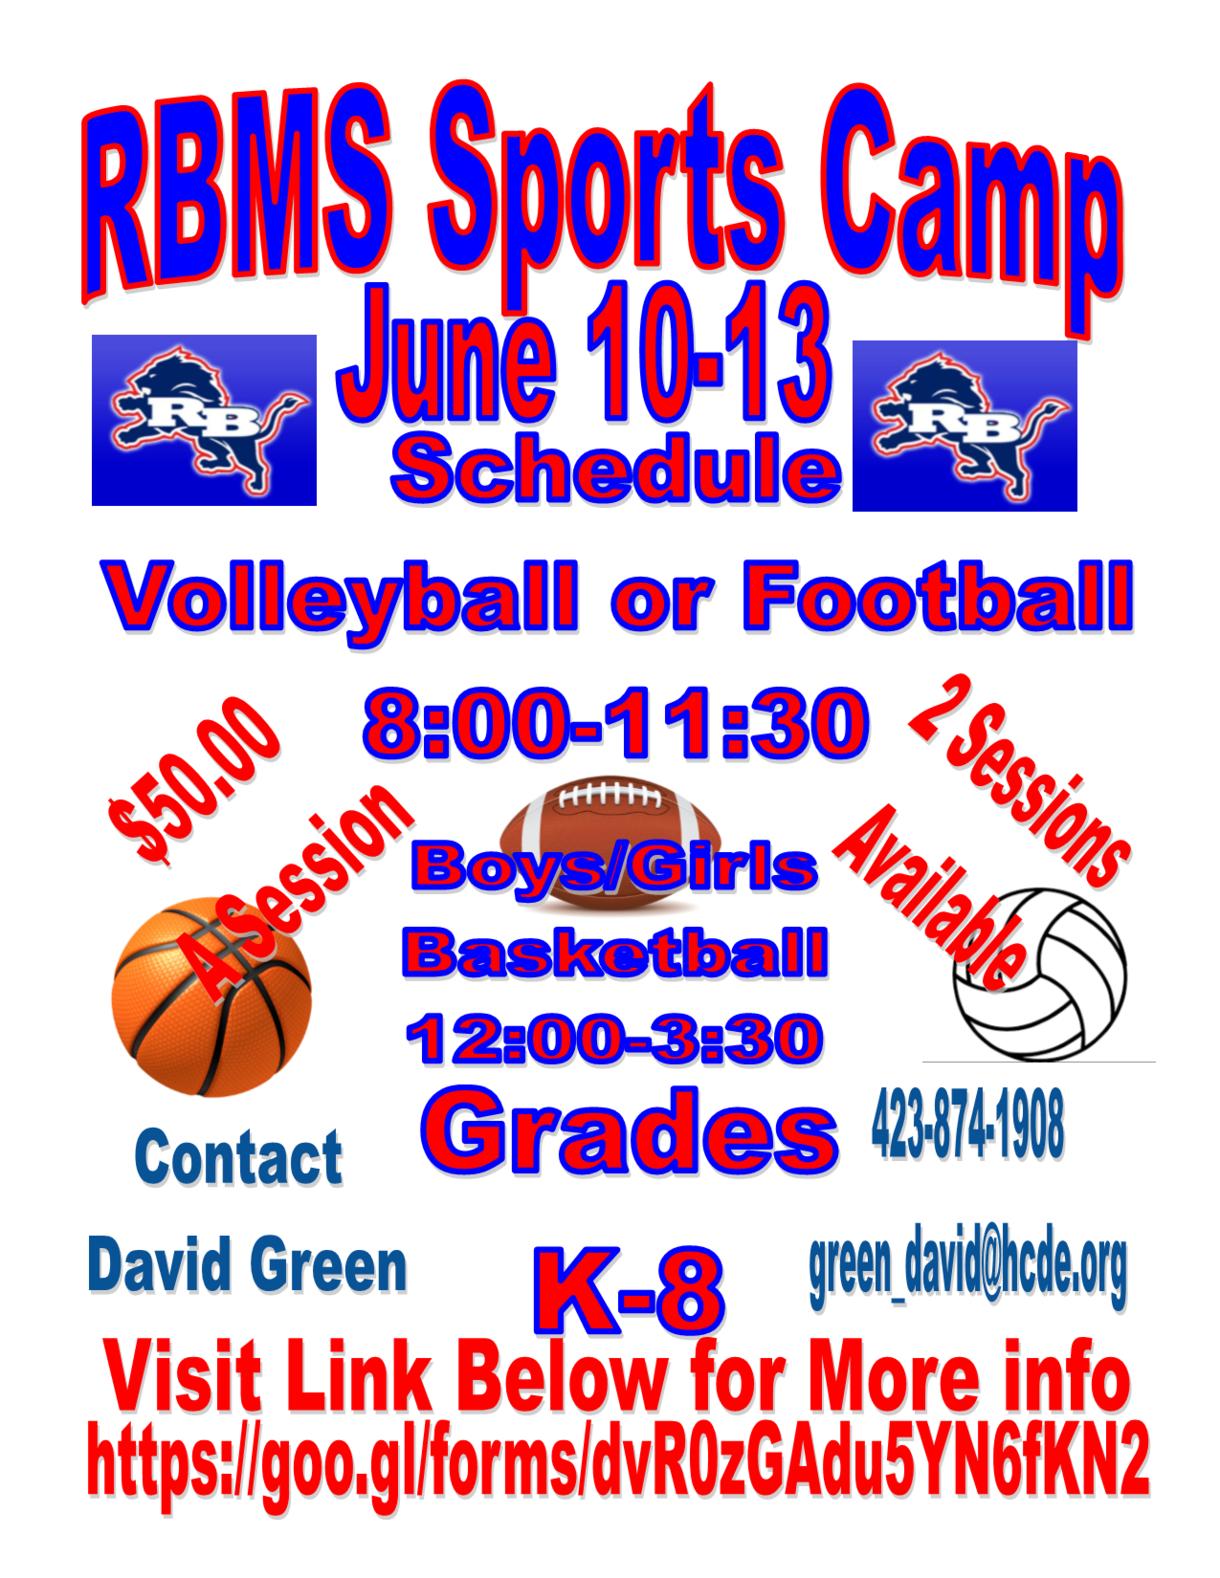 RBMS Sports Camp